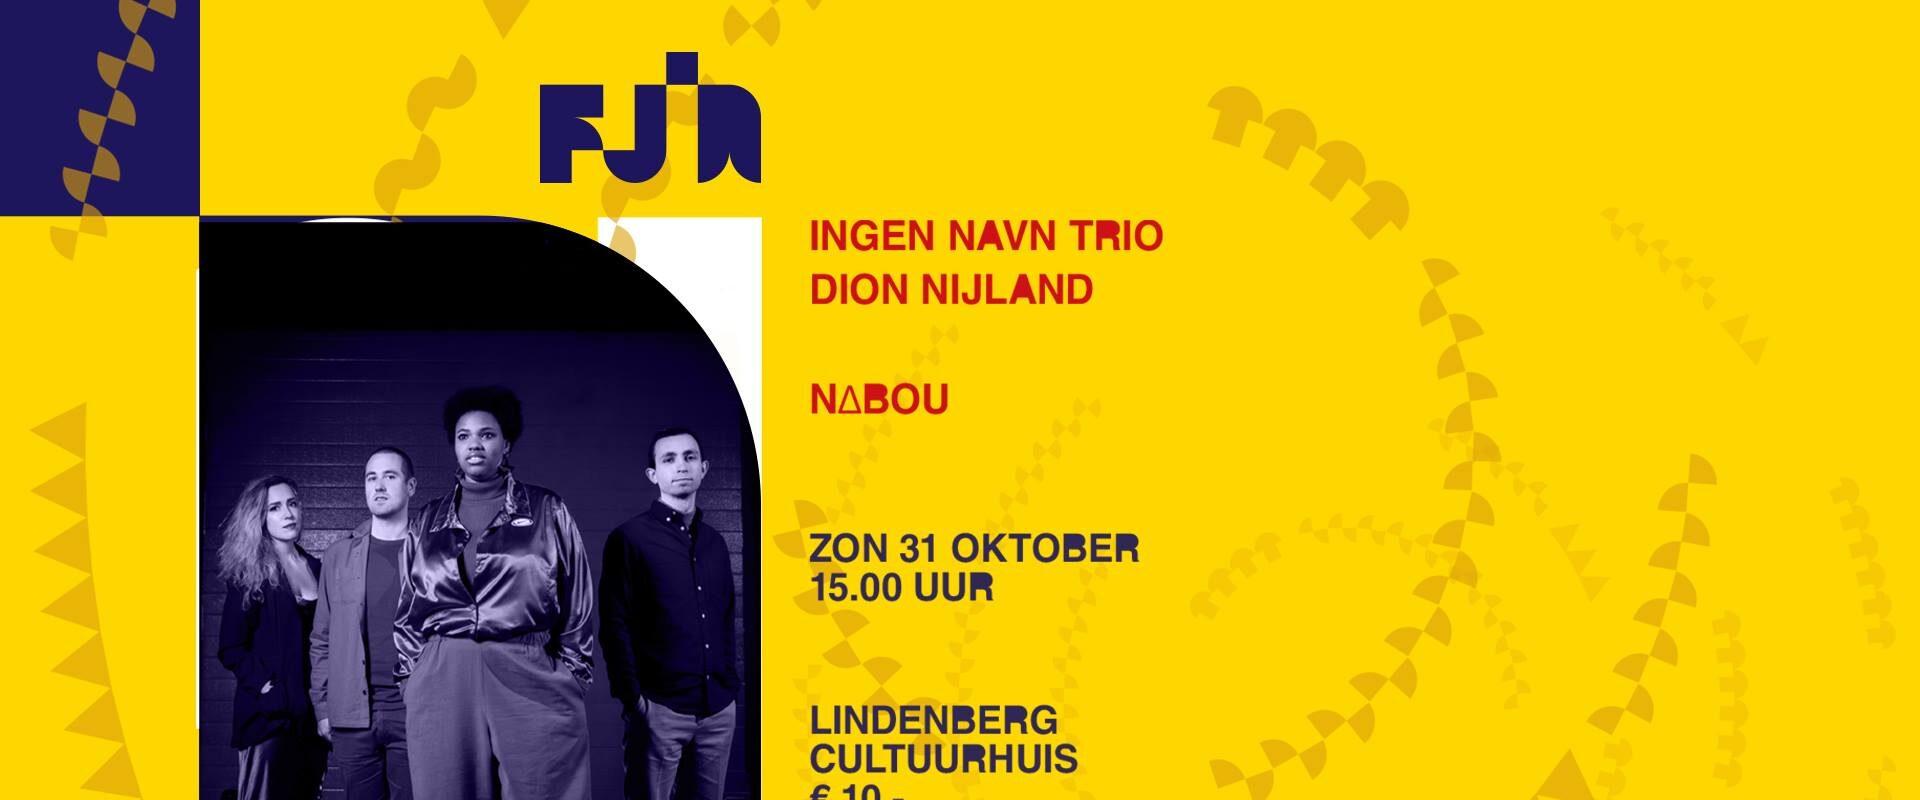 FJIN 2021 • Ingen Navn Trio & Dion Nijland • NΔBOU 2